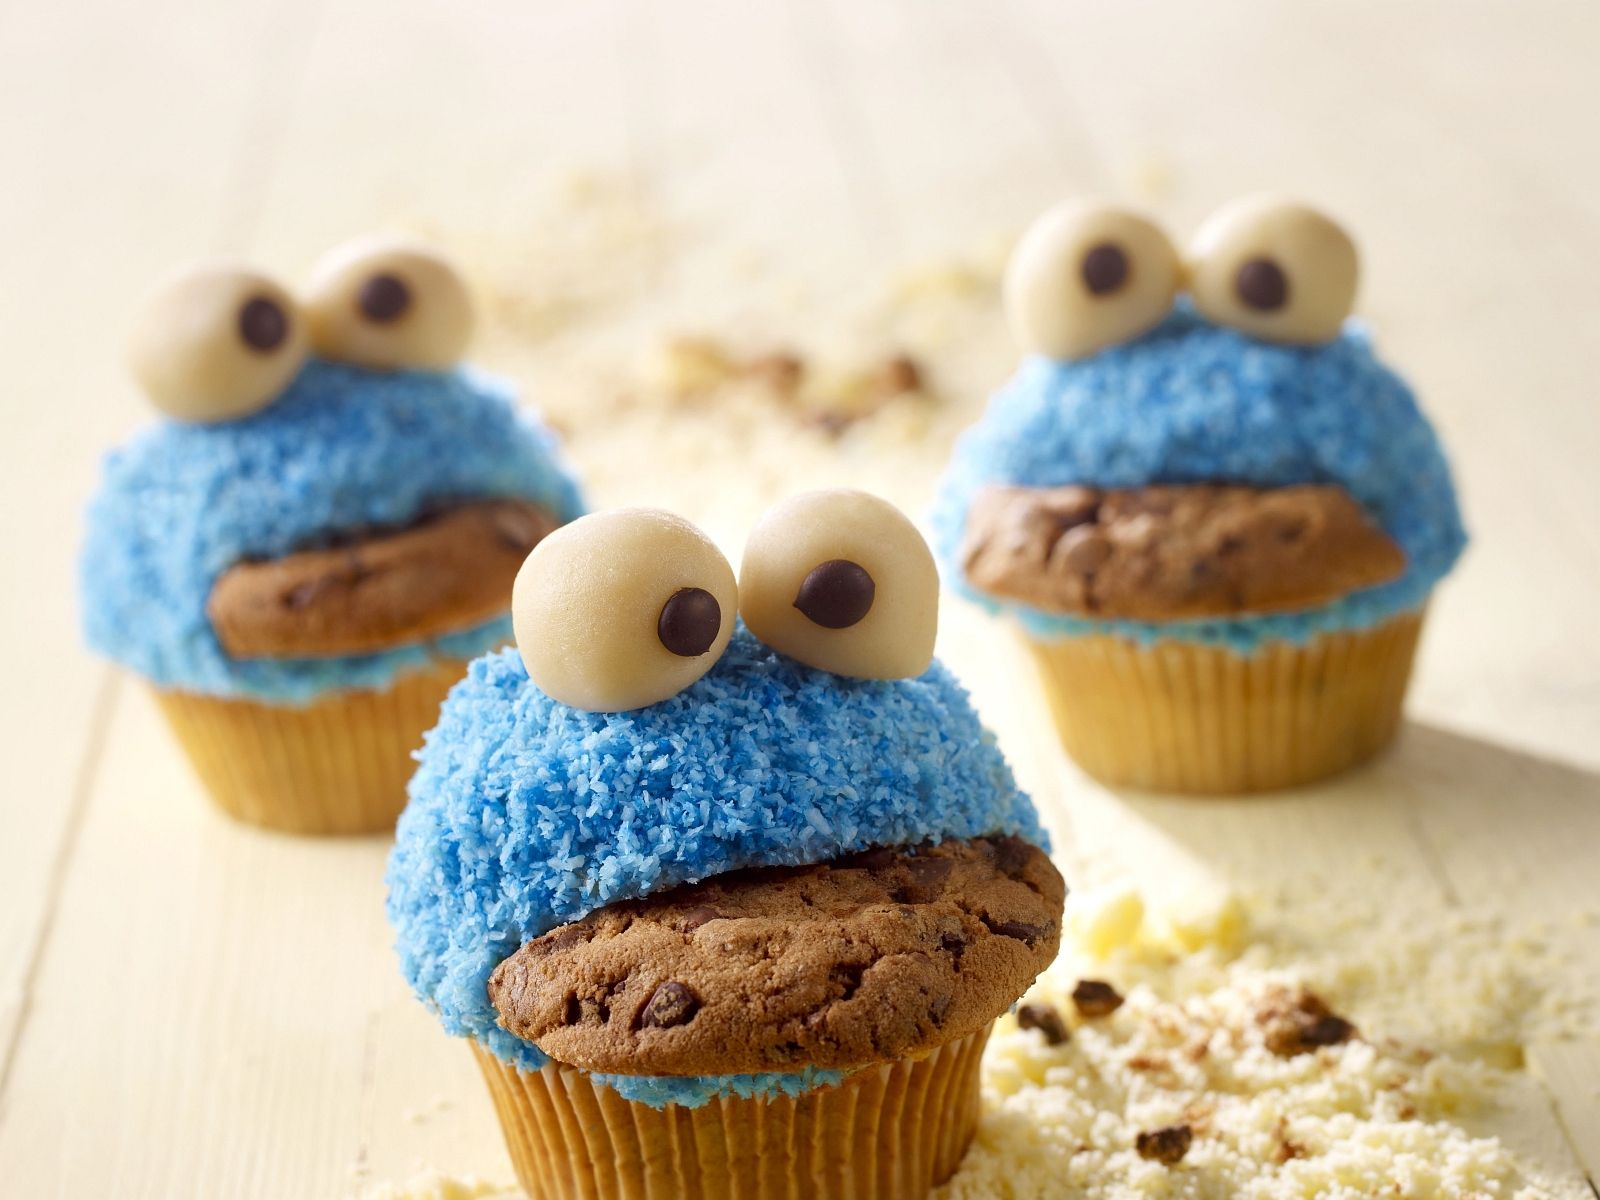 lustige monster muffins recipe muffin cupcake food and kuchen. Black Bedroom Furniture Sets. Home Design Ideas